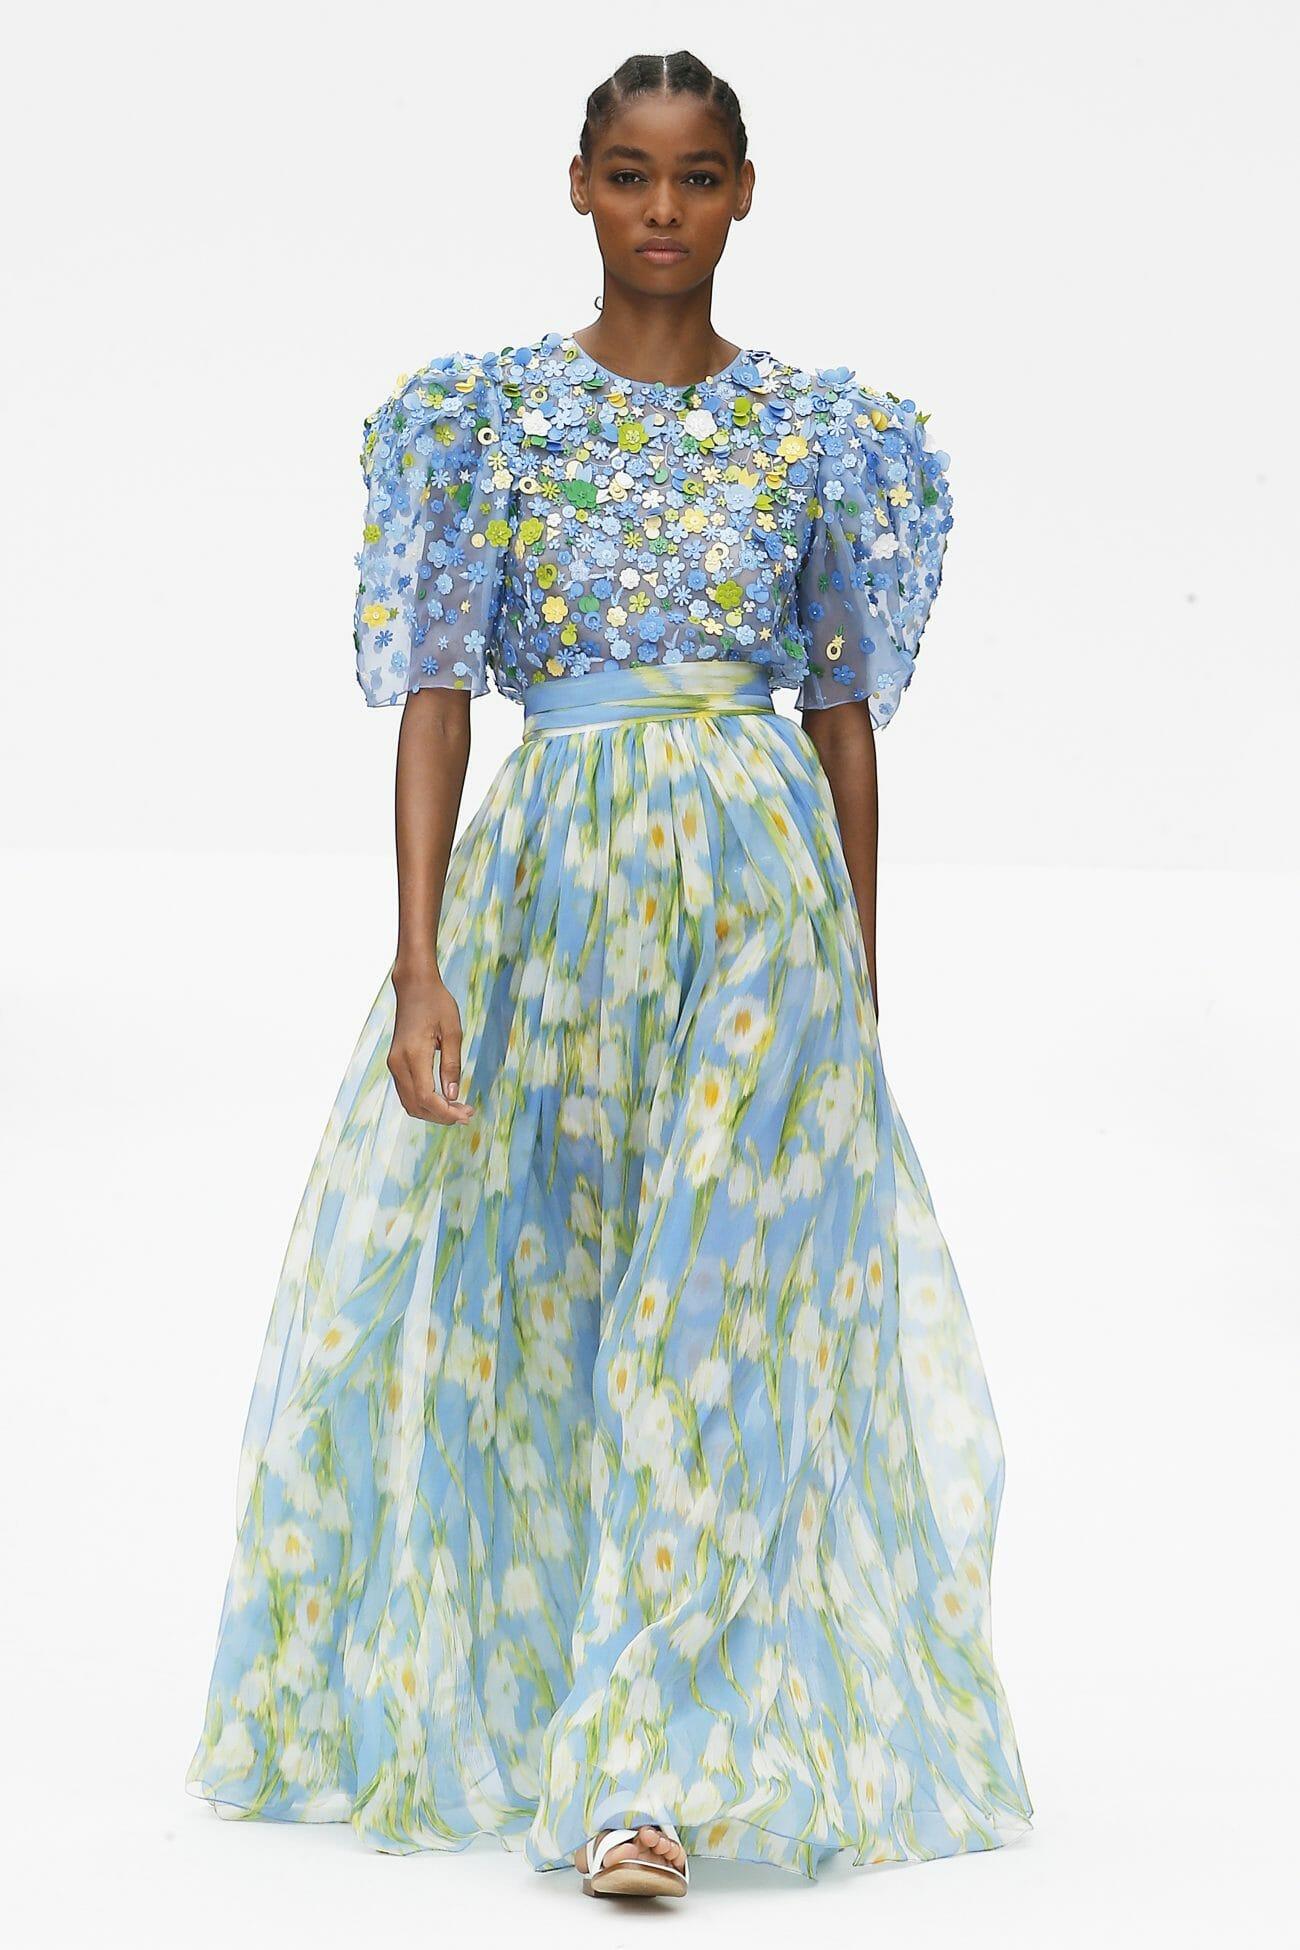 Carolina Herrera New York blue floral dress